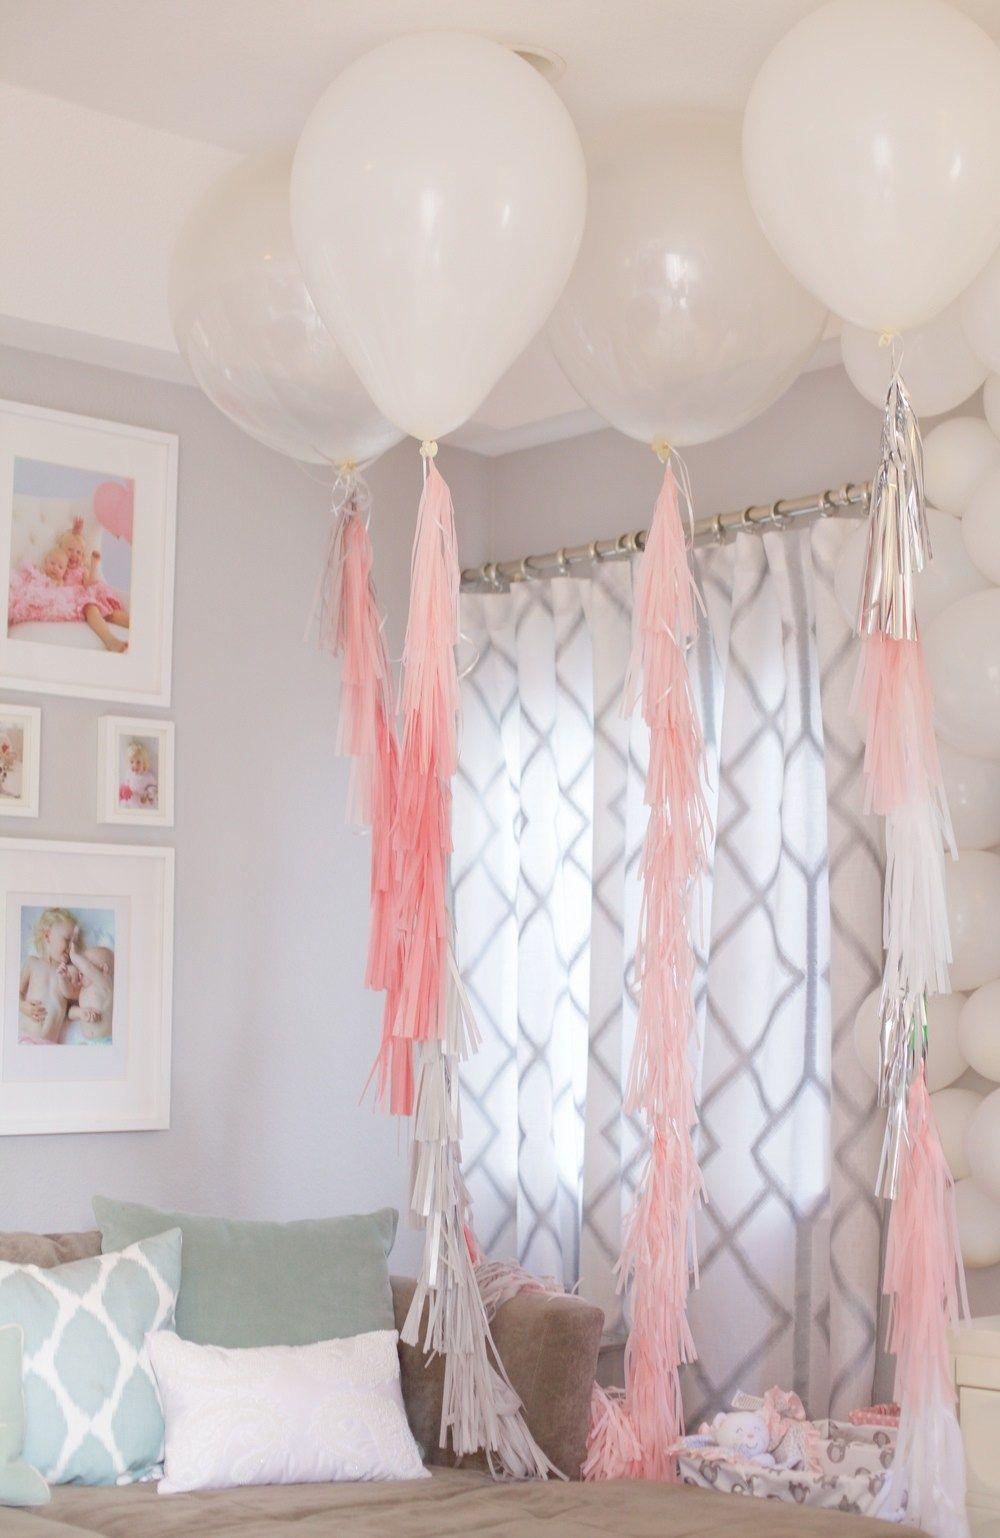 Diy Baby Girl First Birthday Party Pinterest Projects Home Made Baby Girl First Birthday Girl Birthday Themes Baby Birthday Party Girl